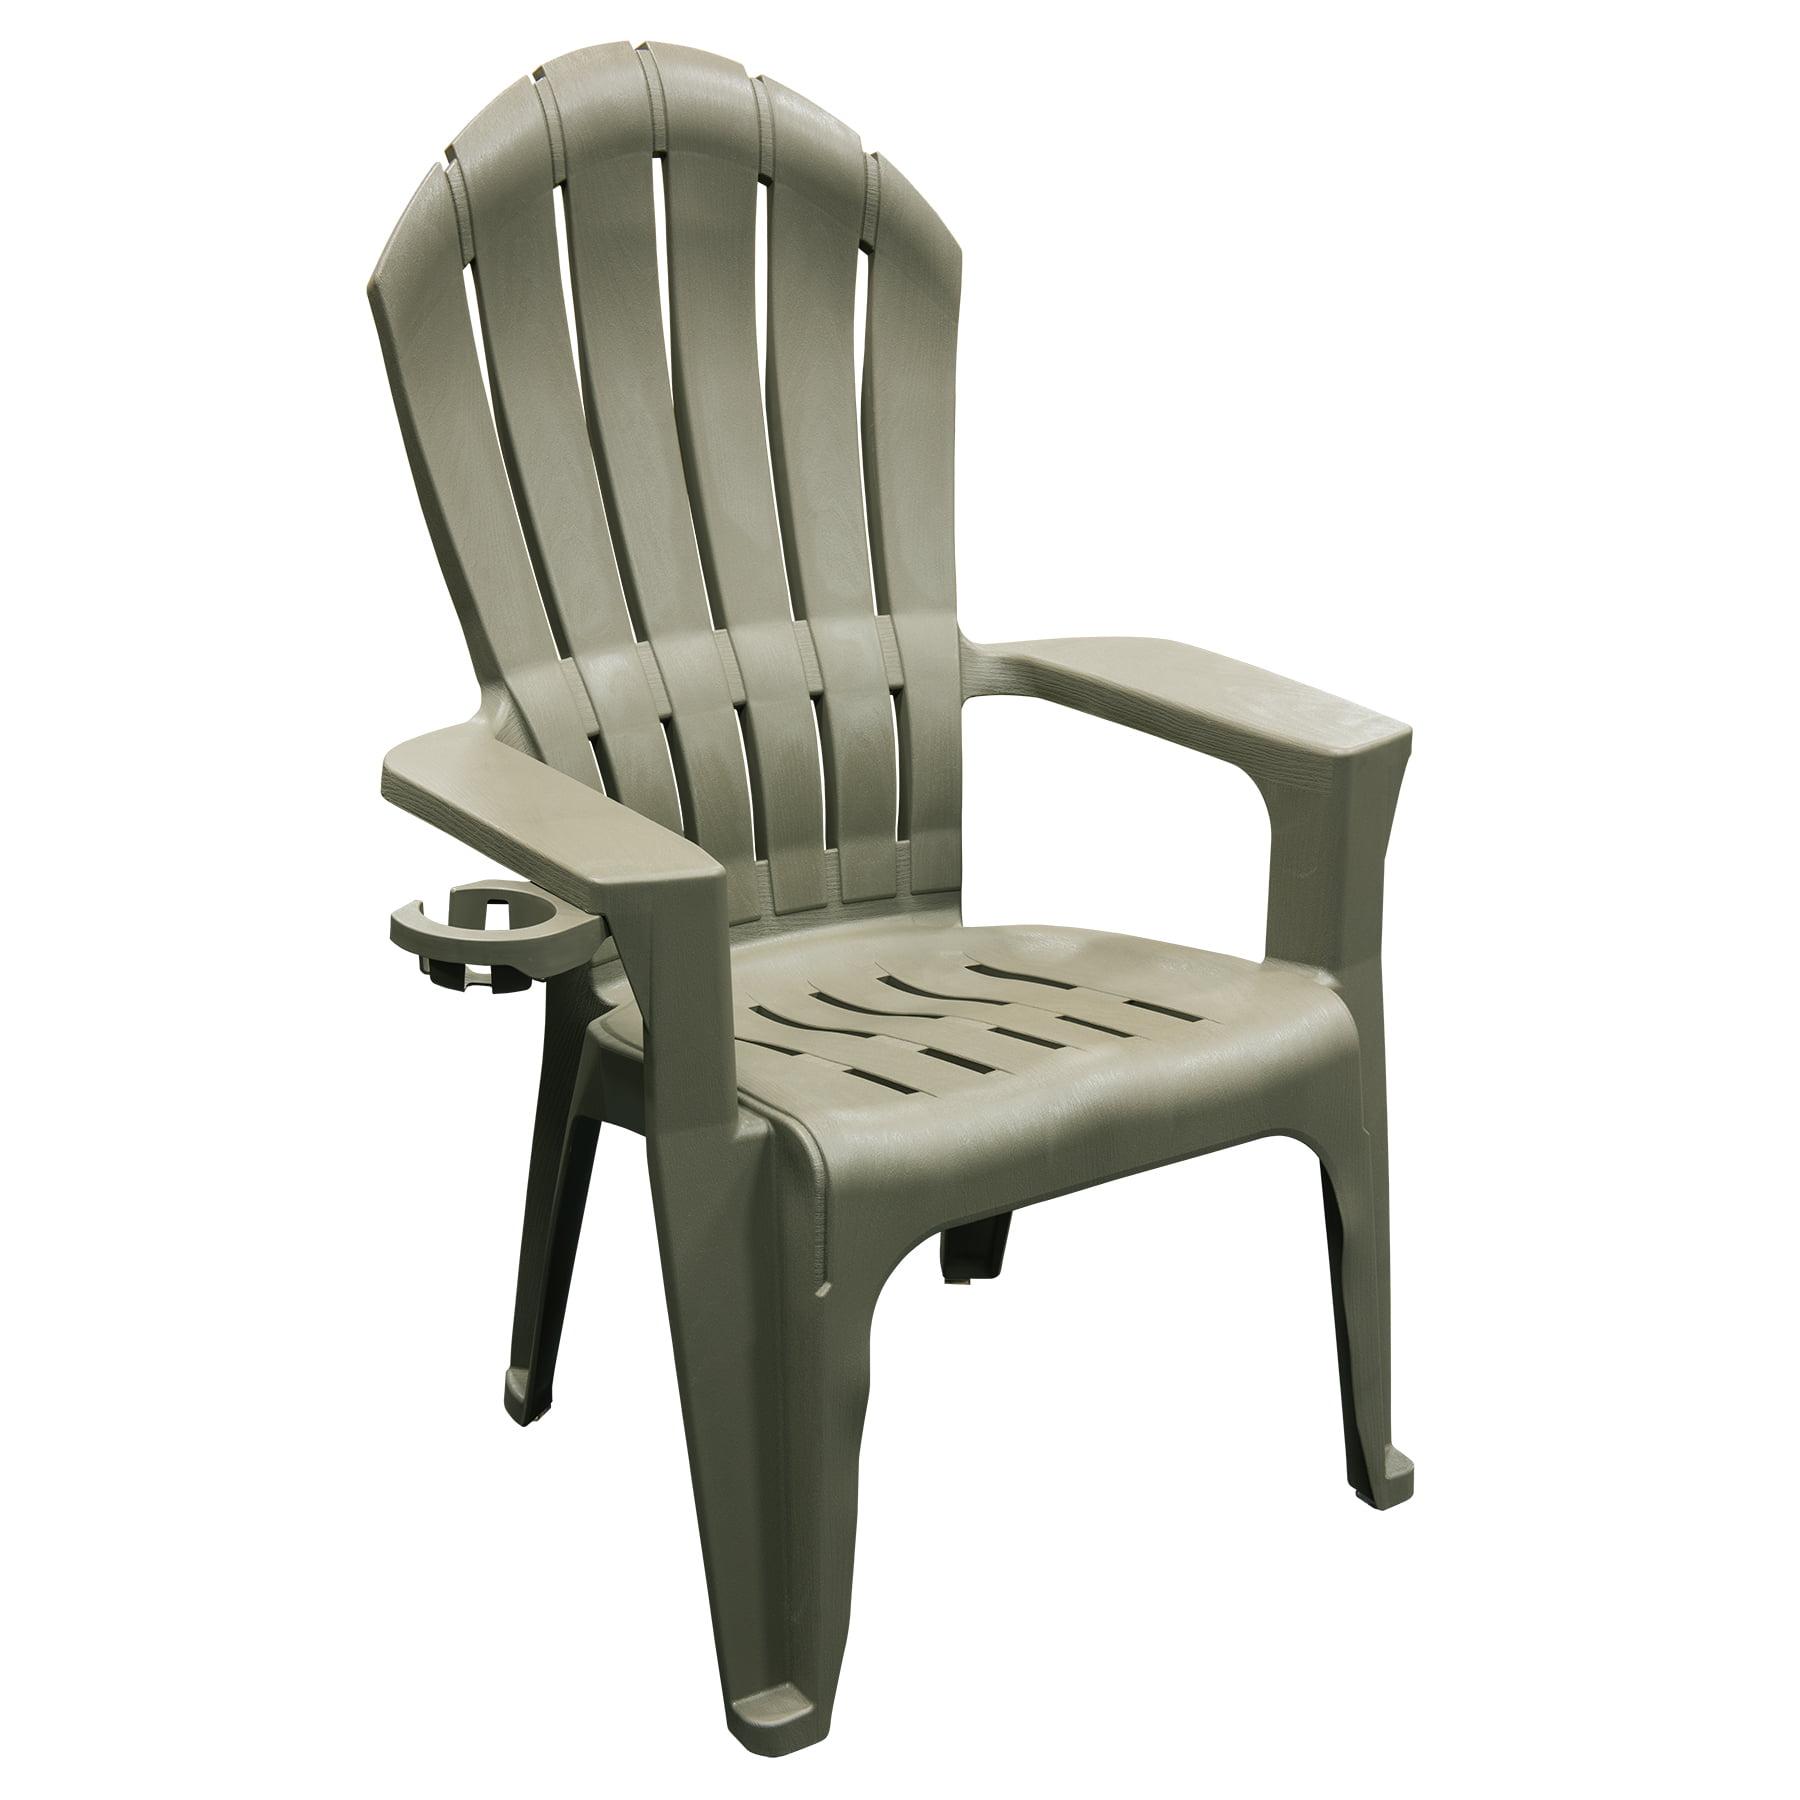 Adams Adirondack Real Comfort Plastic Rocking Chair Gray